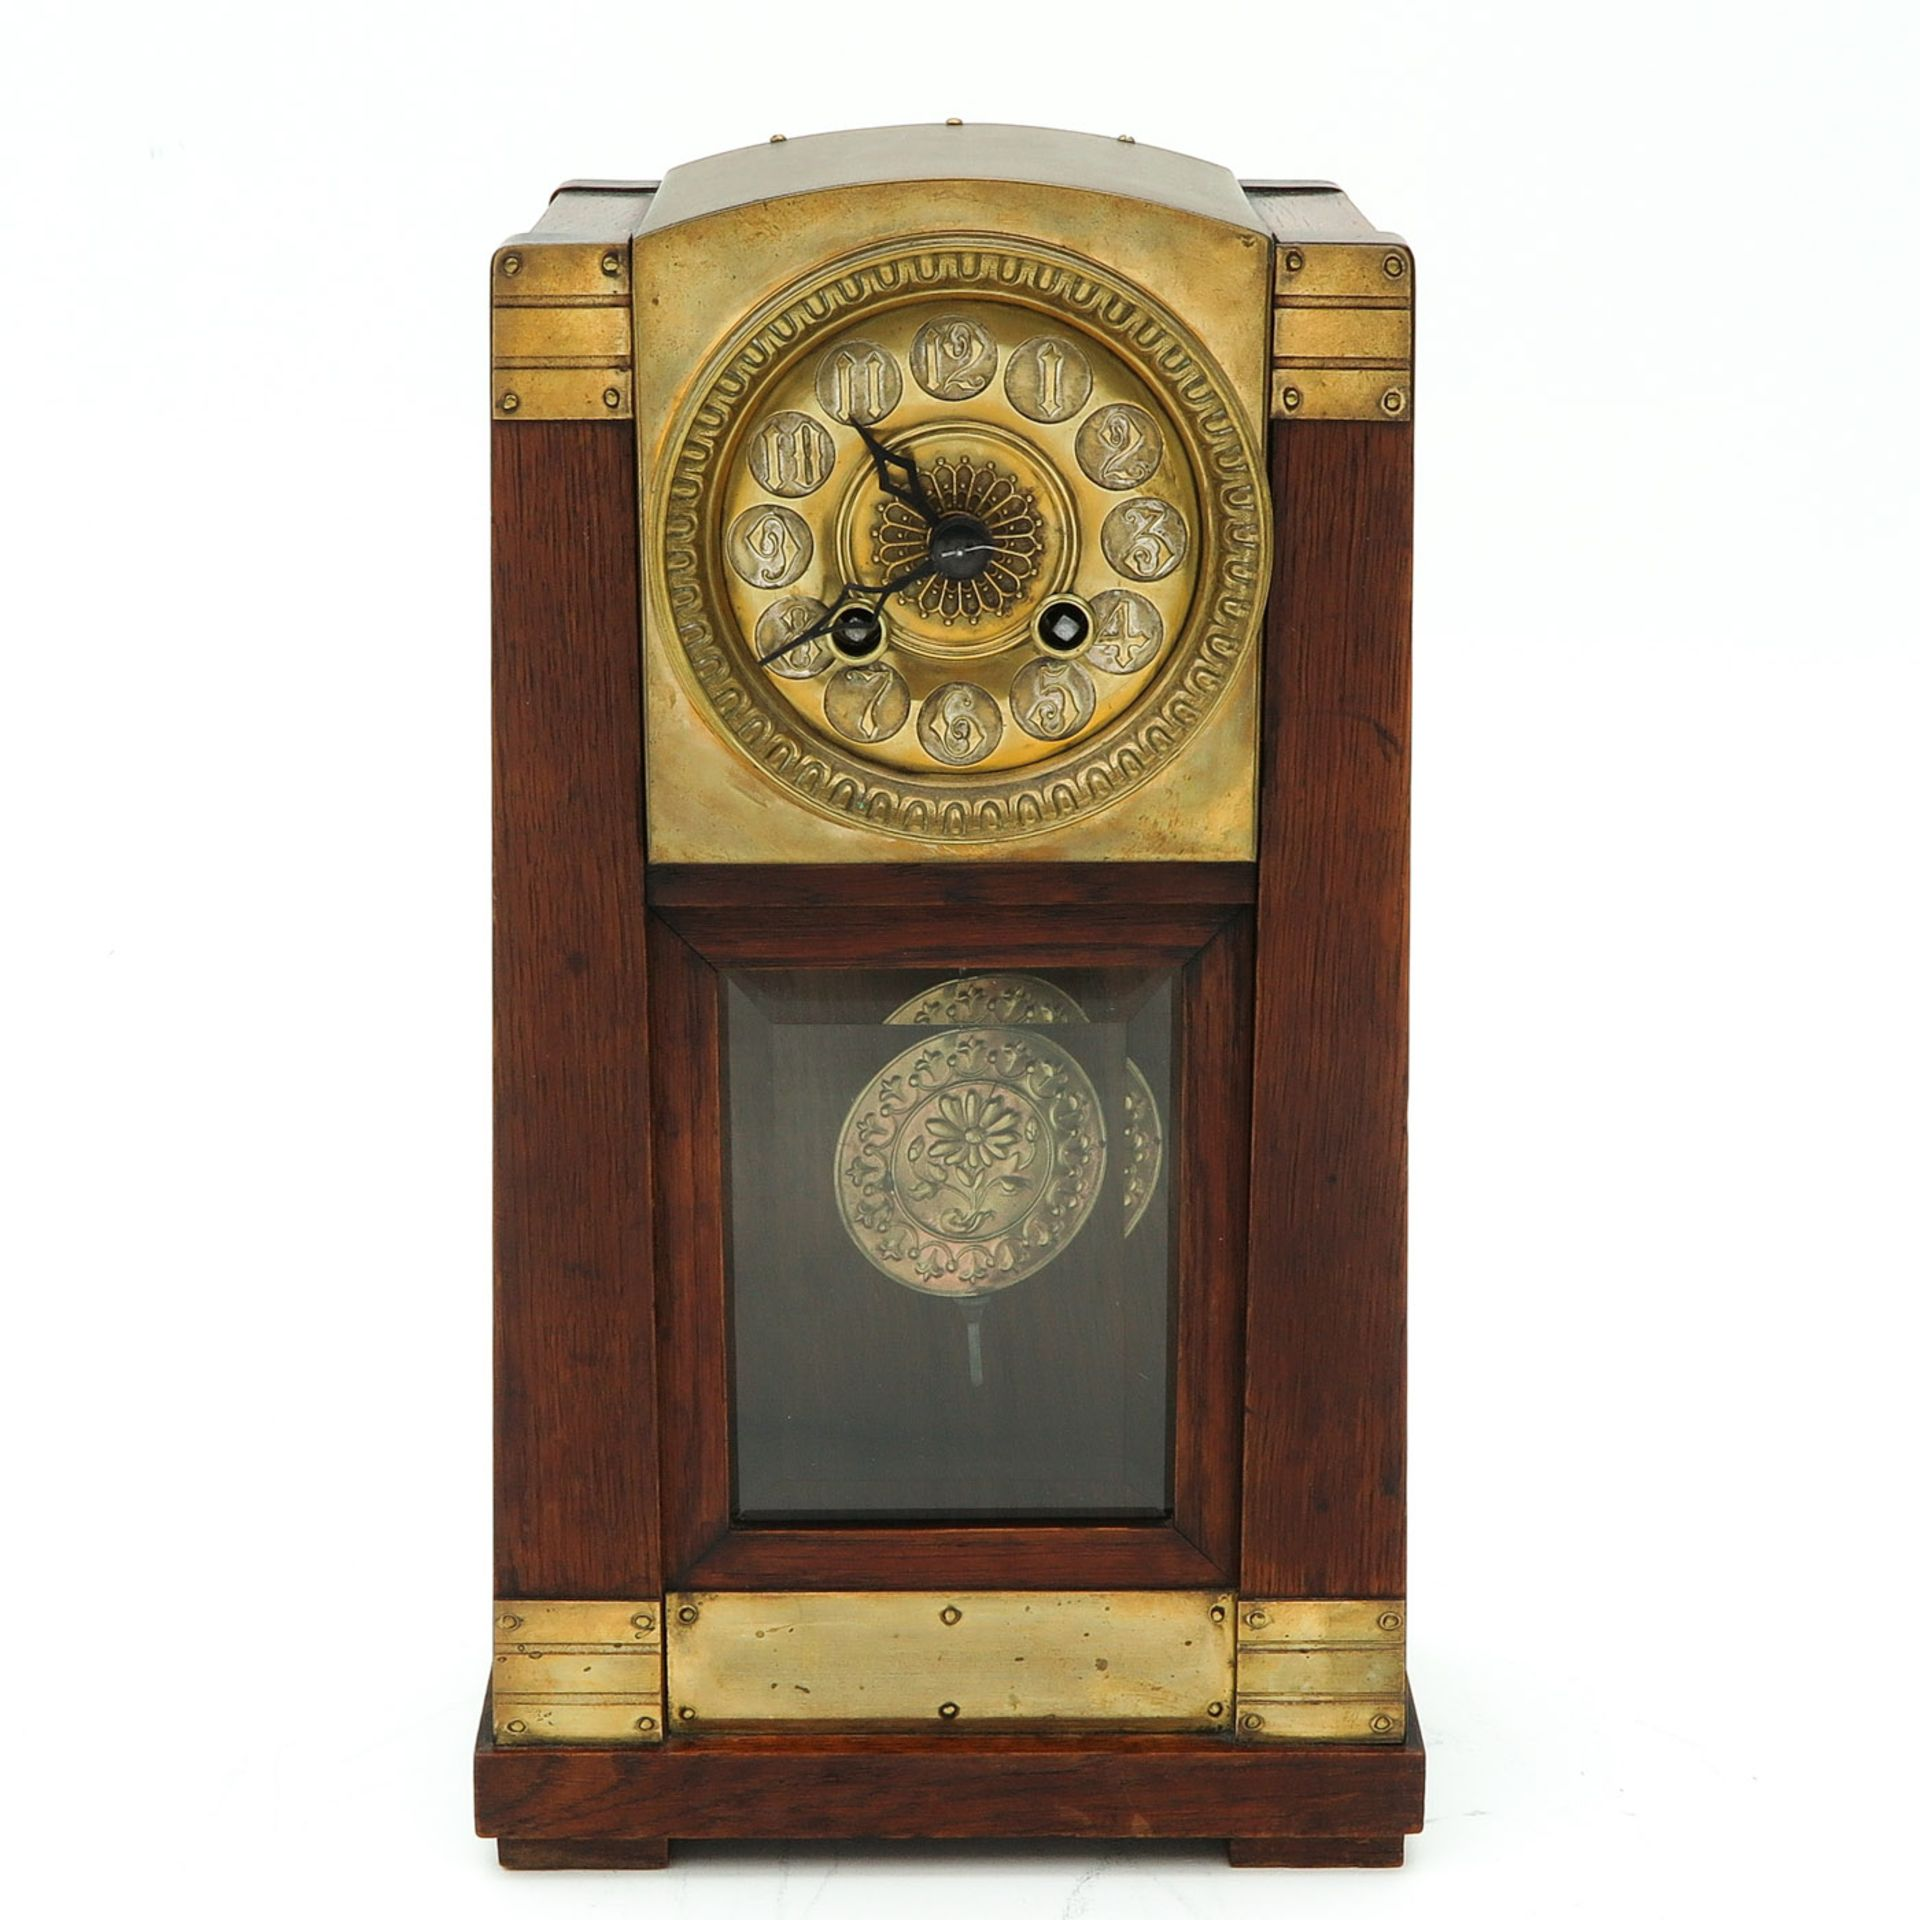 Los 1152 - An Amsterdam School Period Pendulum